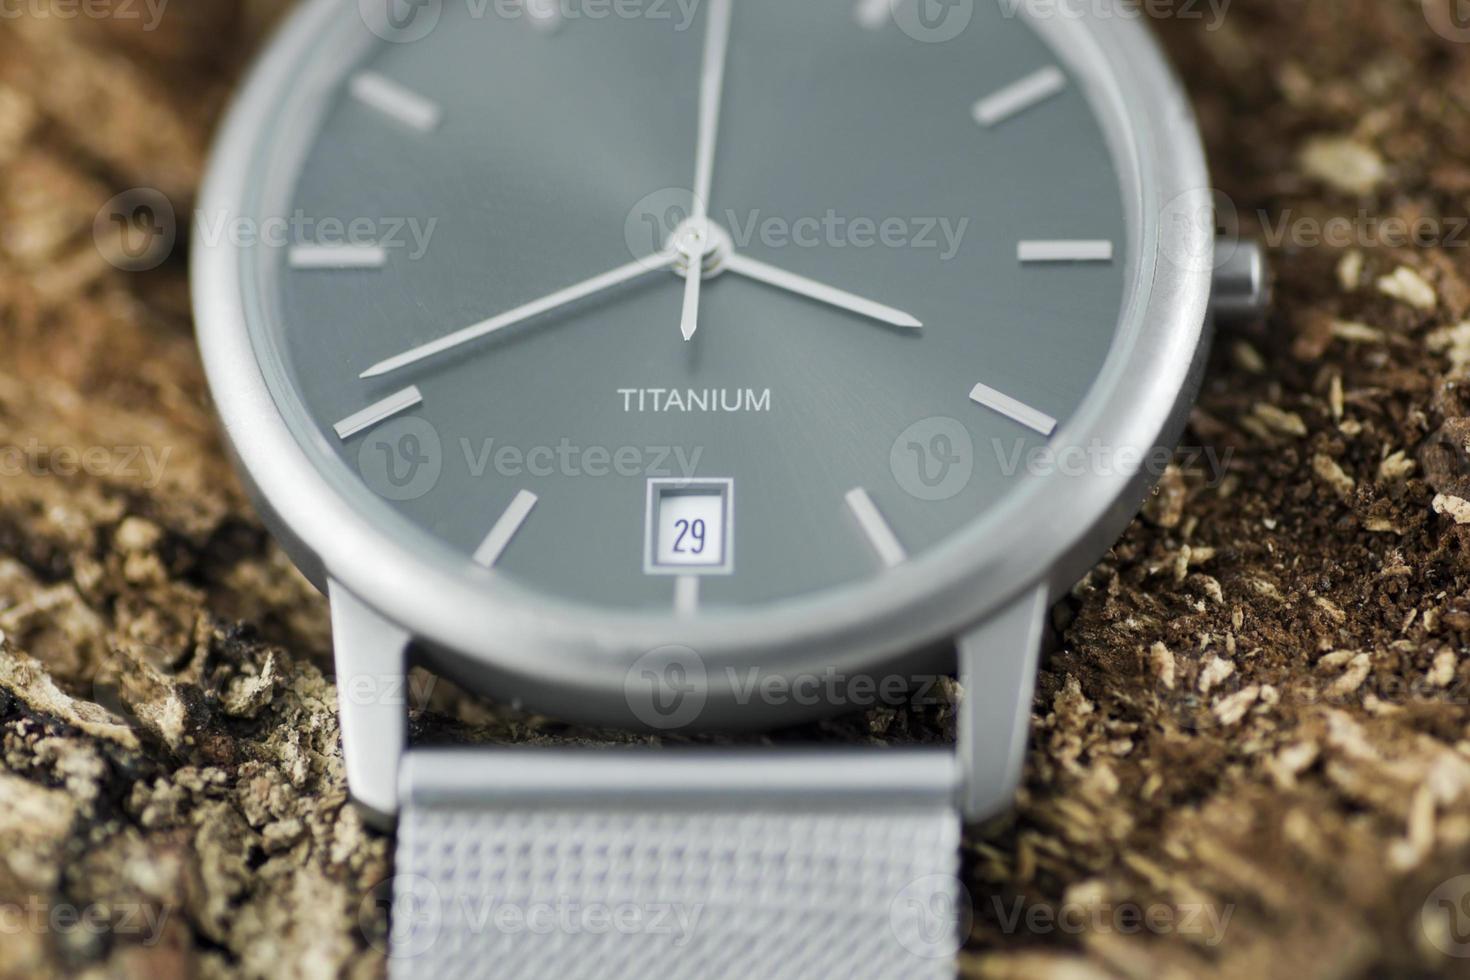 reloj de titanio en corteza de árbol foto